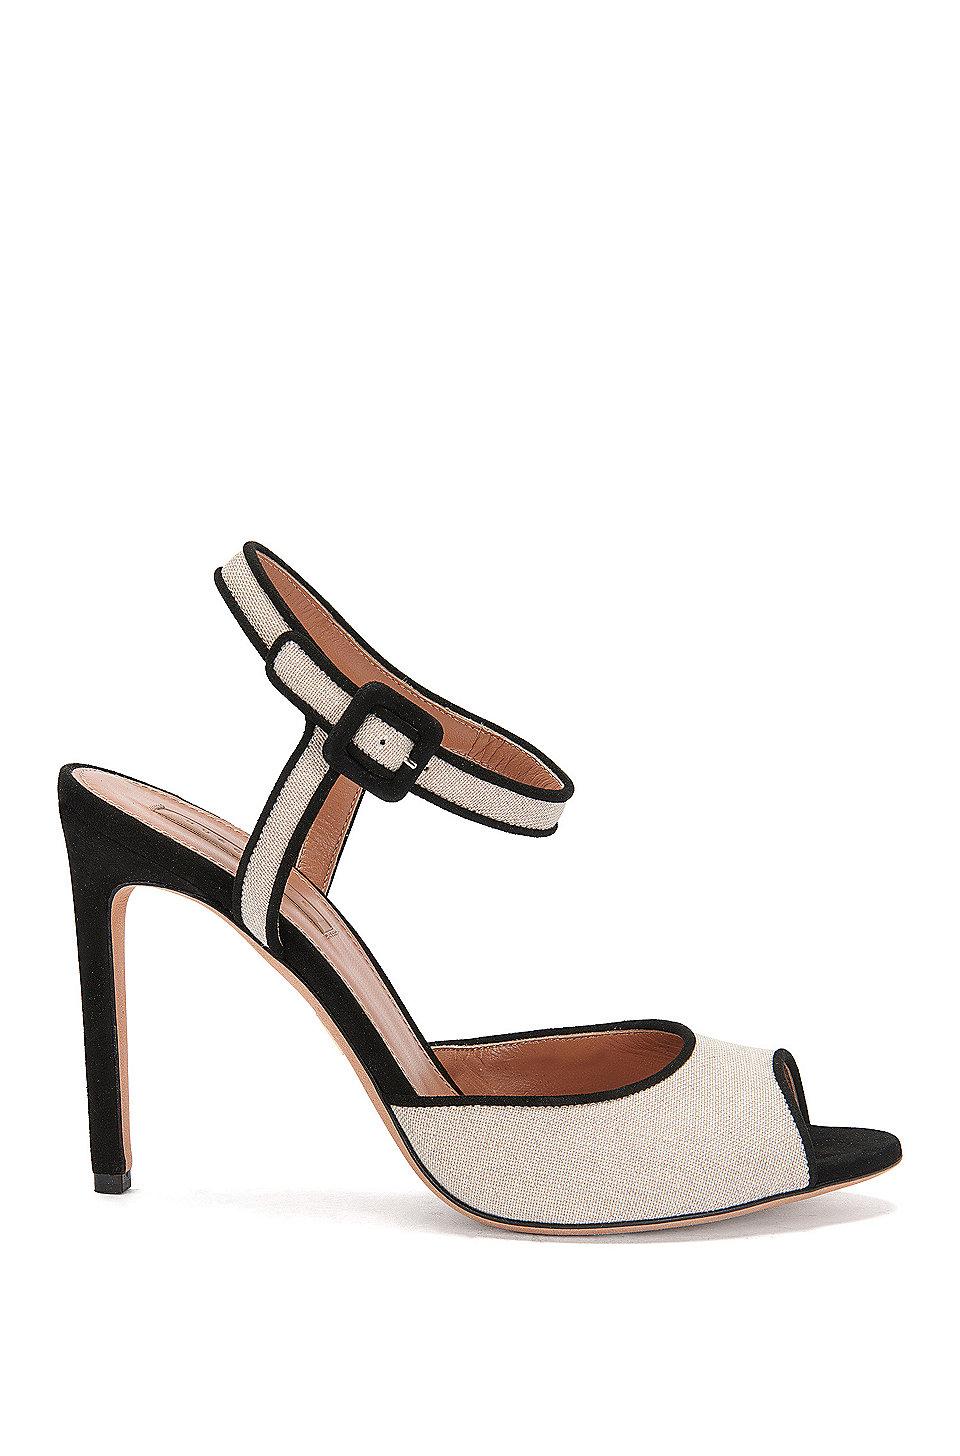 Hugo Boss Female Shoes Sale